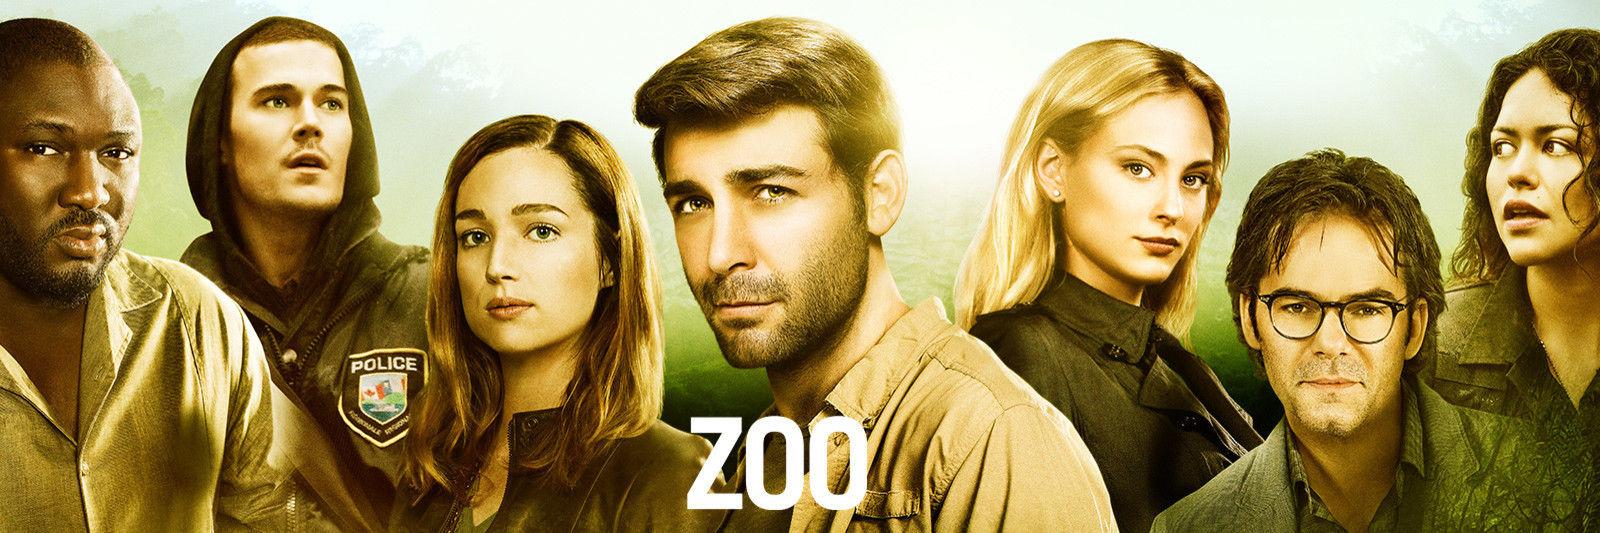 27 zoo 1600 x 640 005 pre